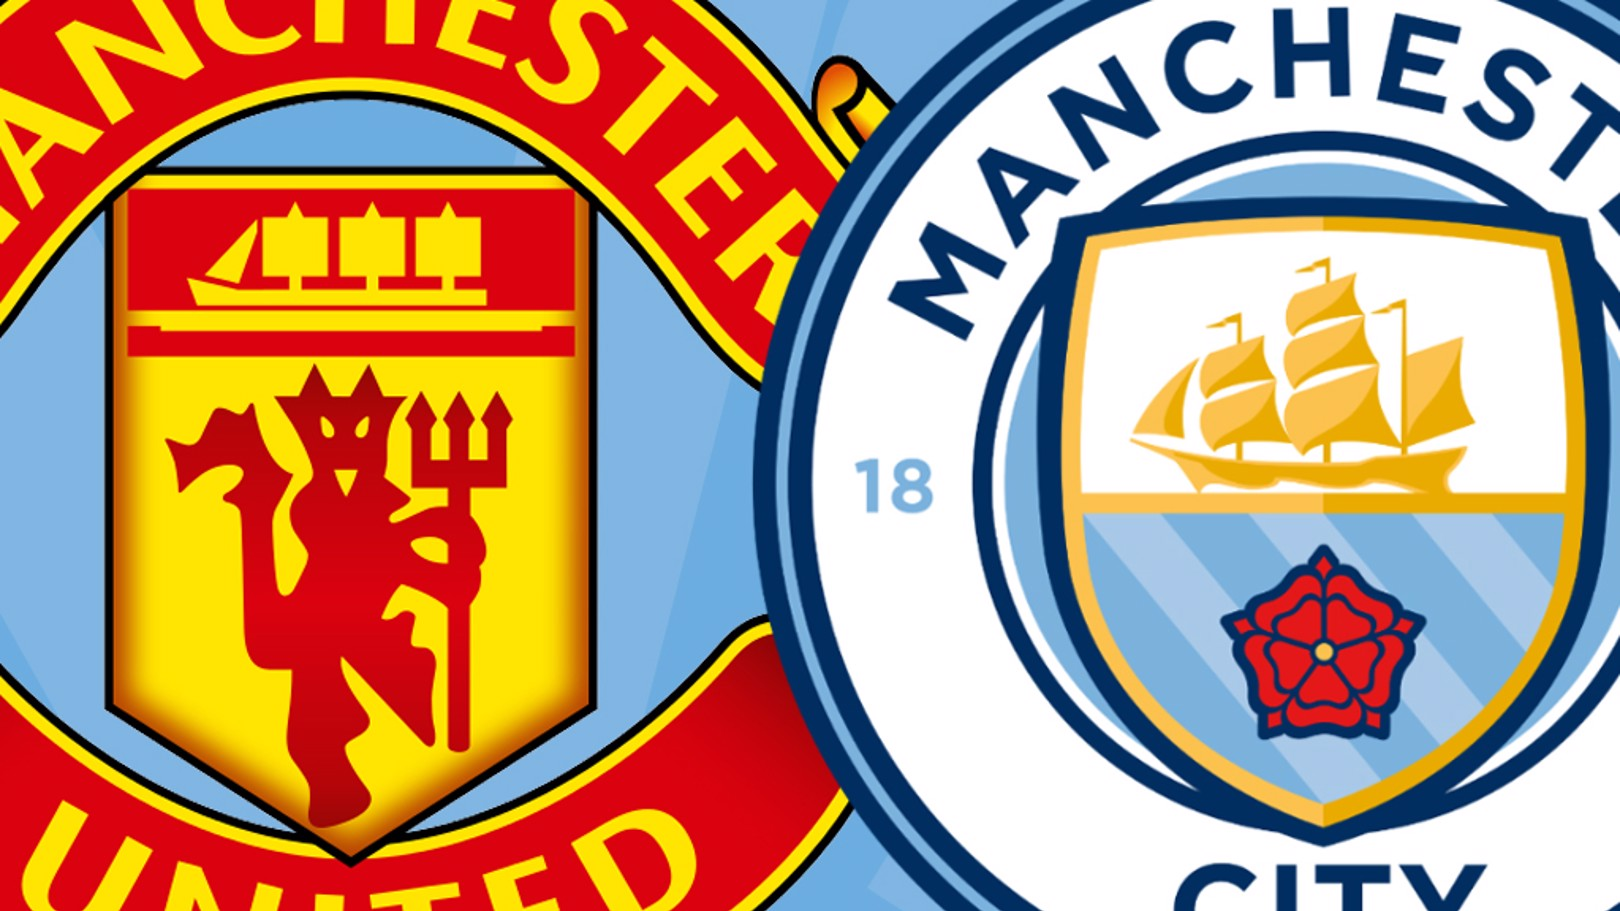 Man United v Man City live match coverage